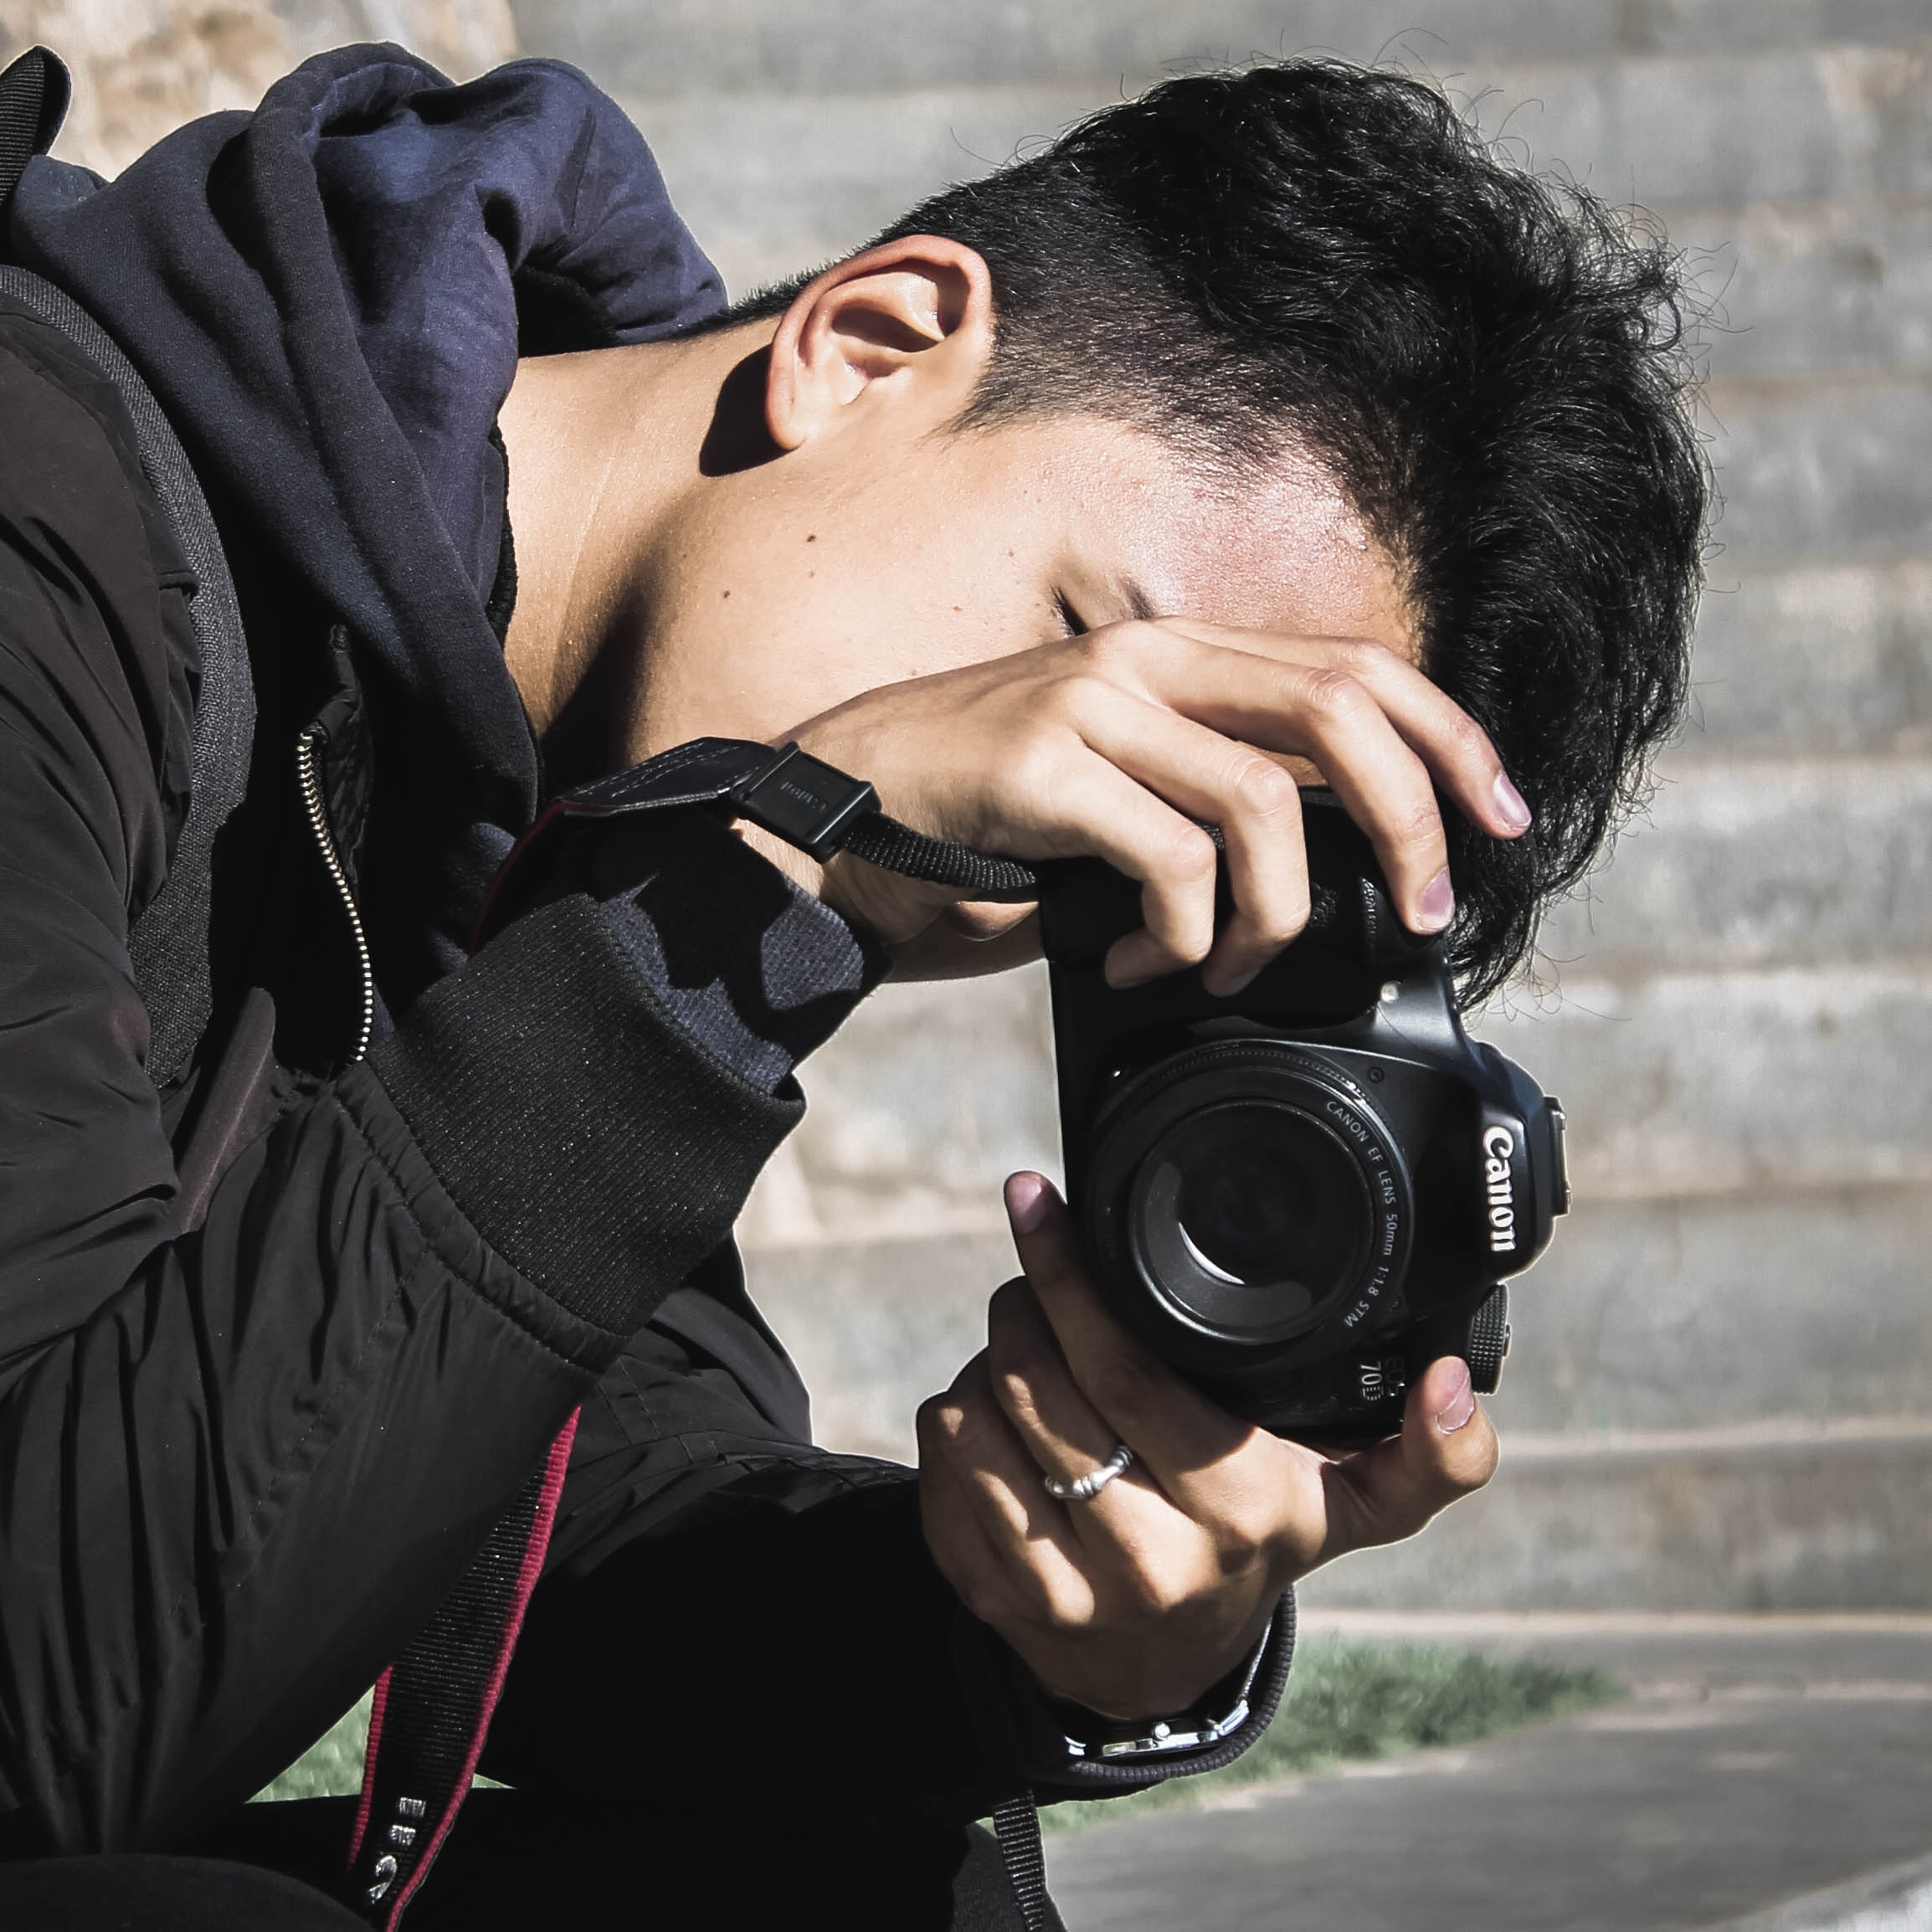 Go to Shashank Thapa's profile